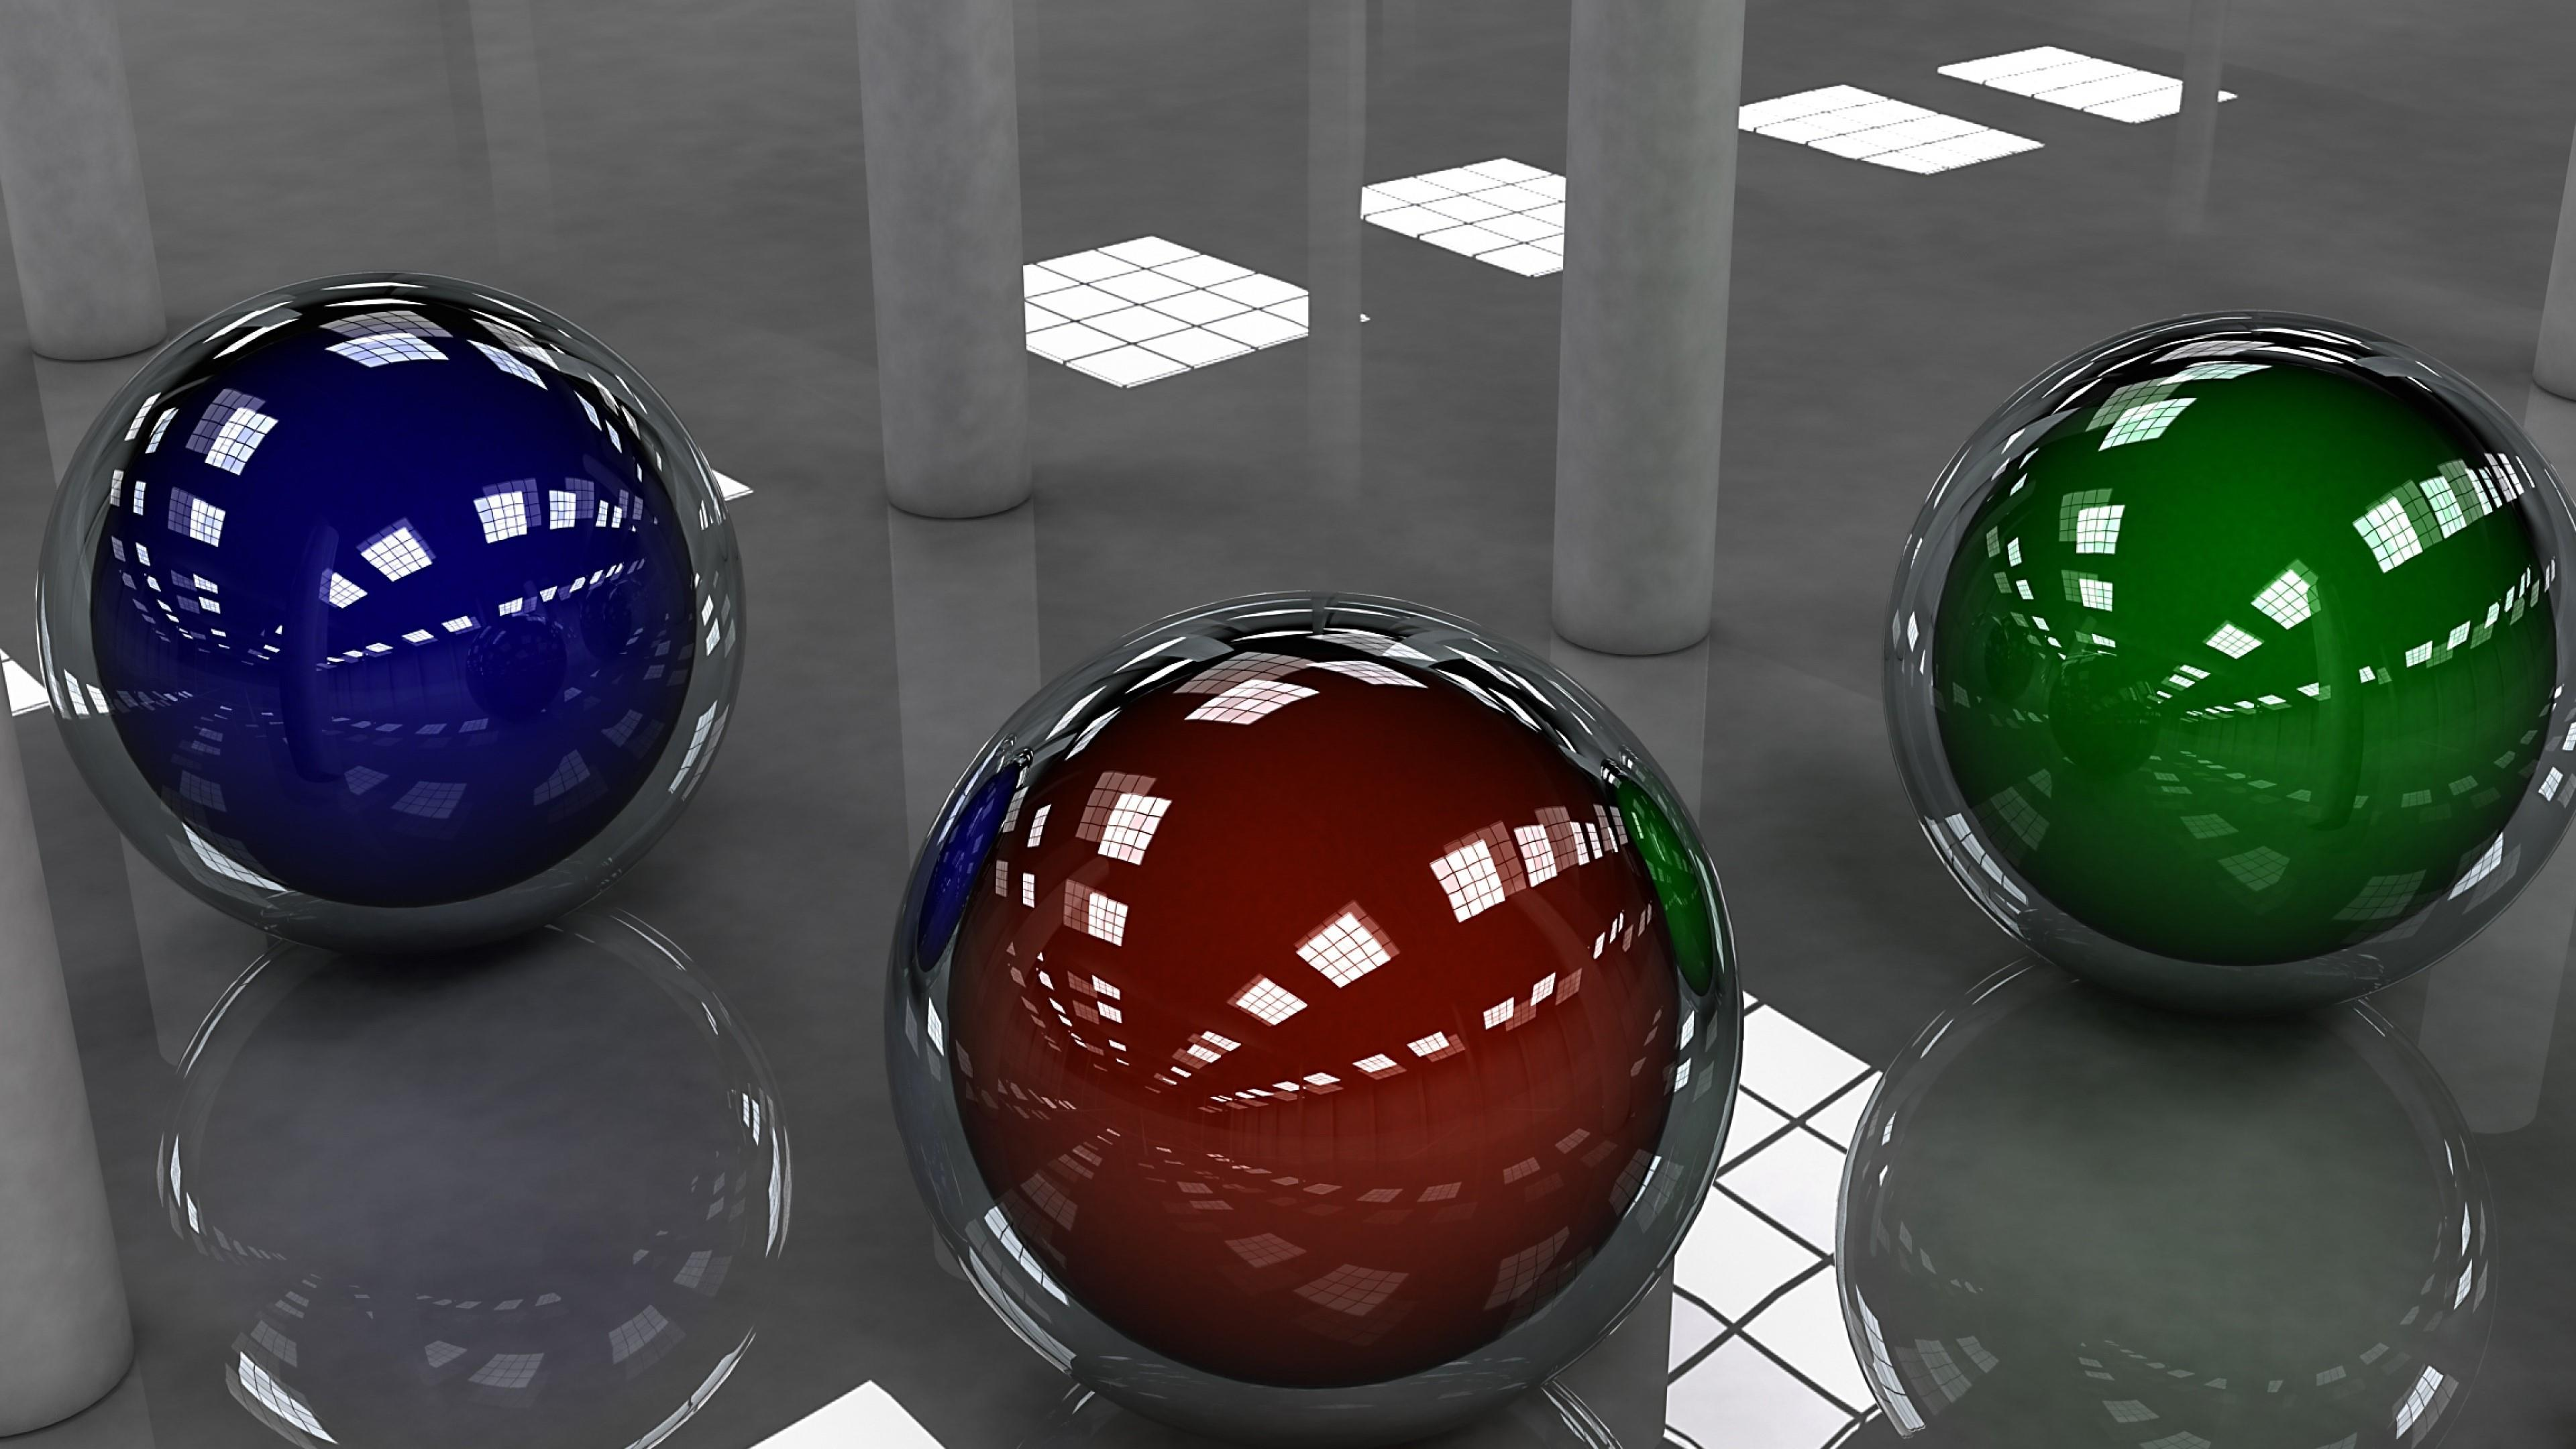 3D spheres in helmet - Digital art wallpaper